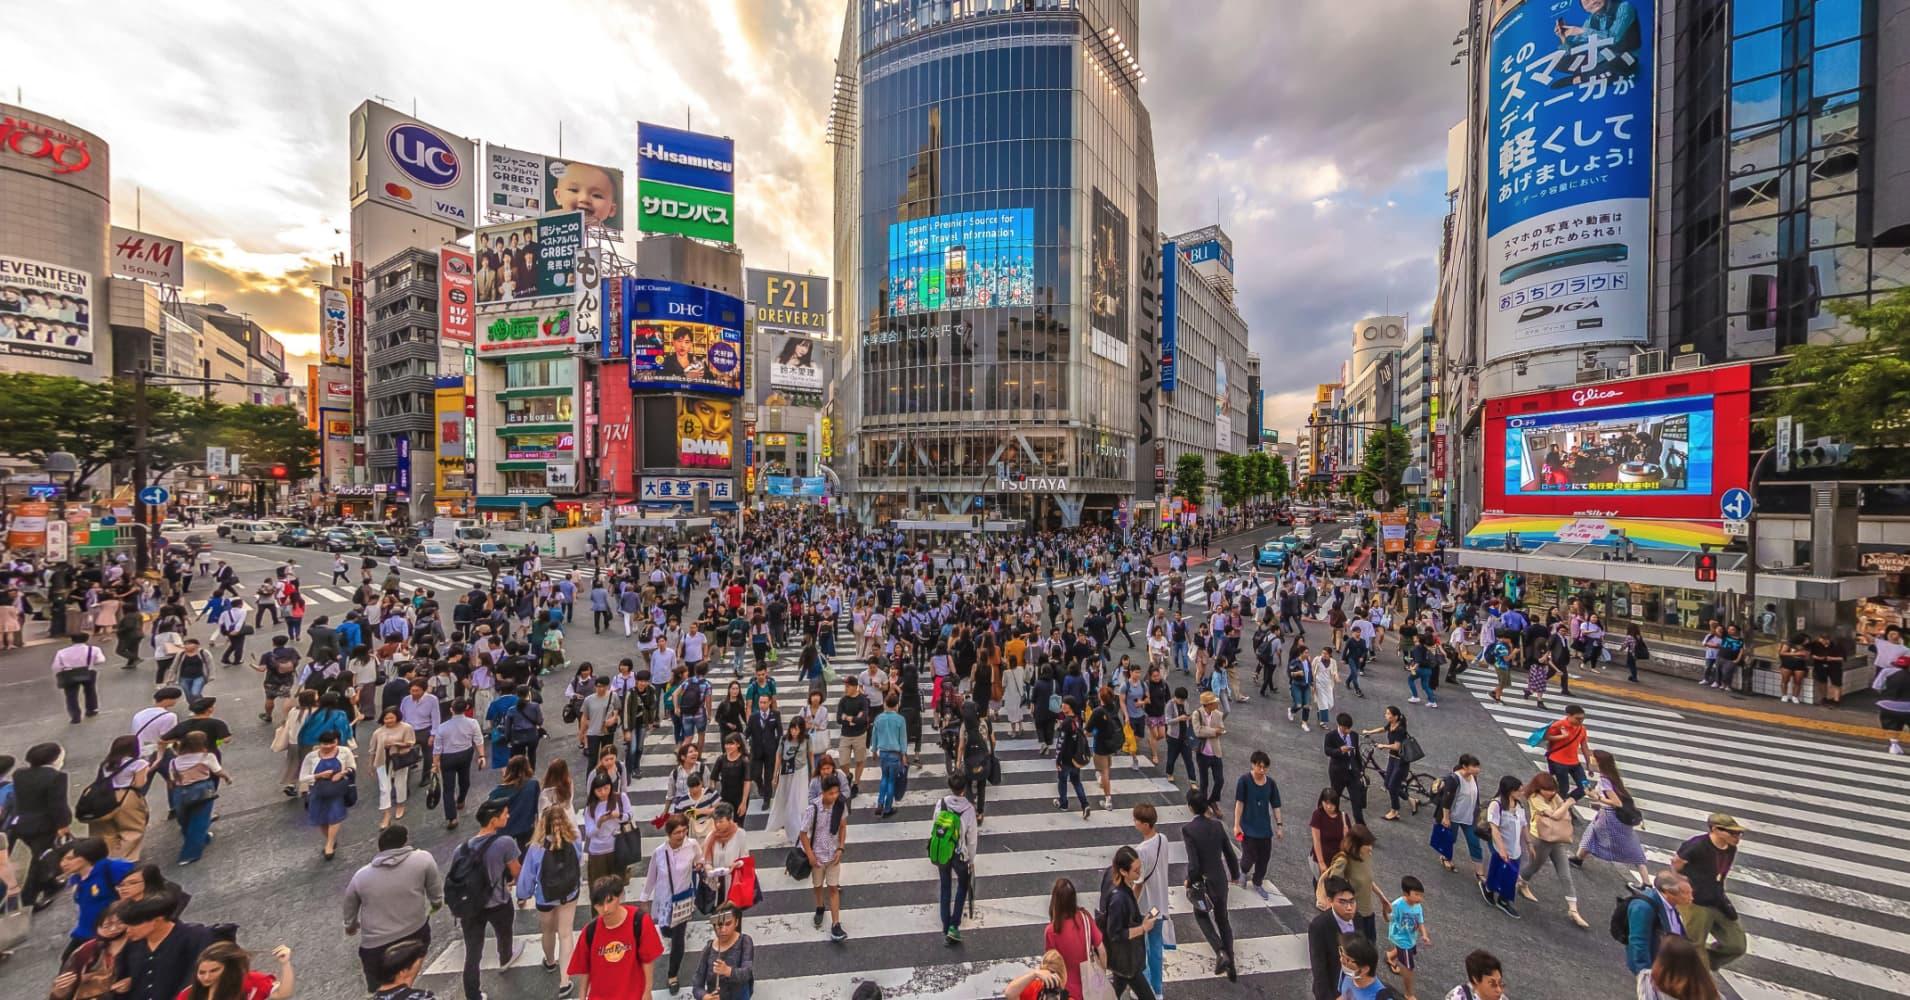 Shibuya: Discover the beating heart of Tokyo